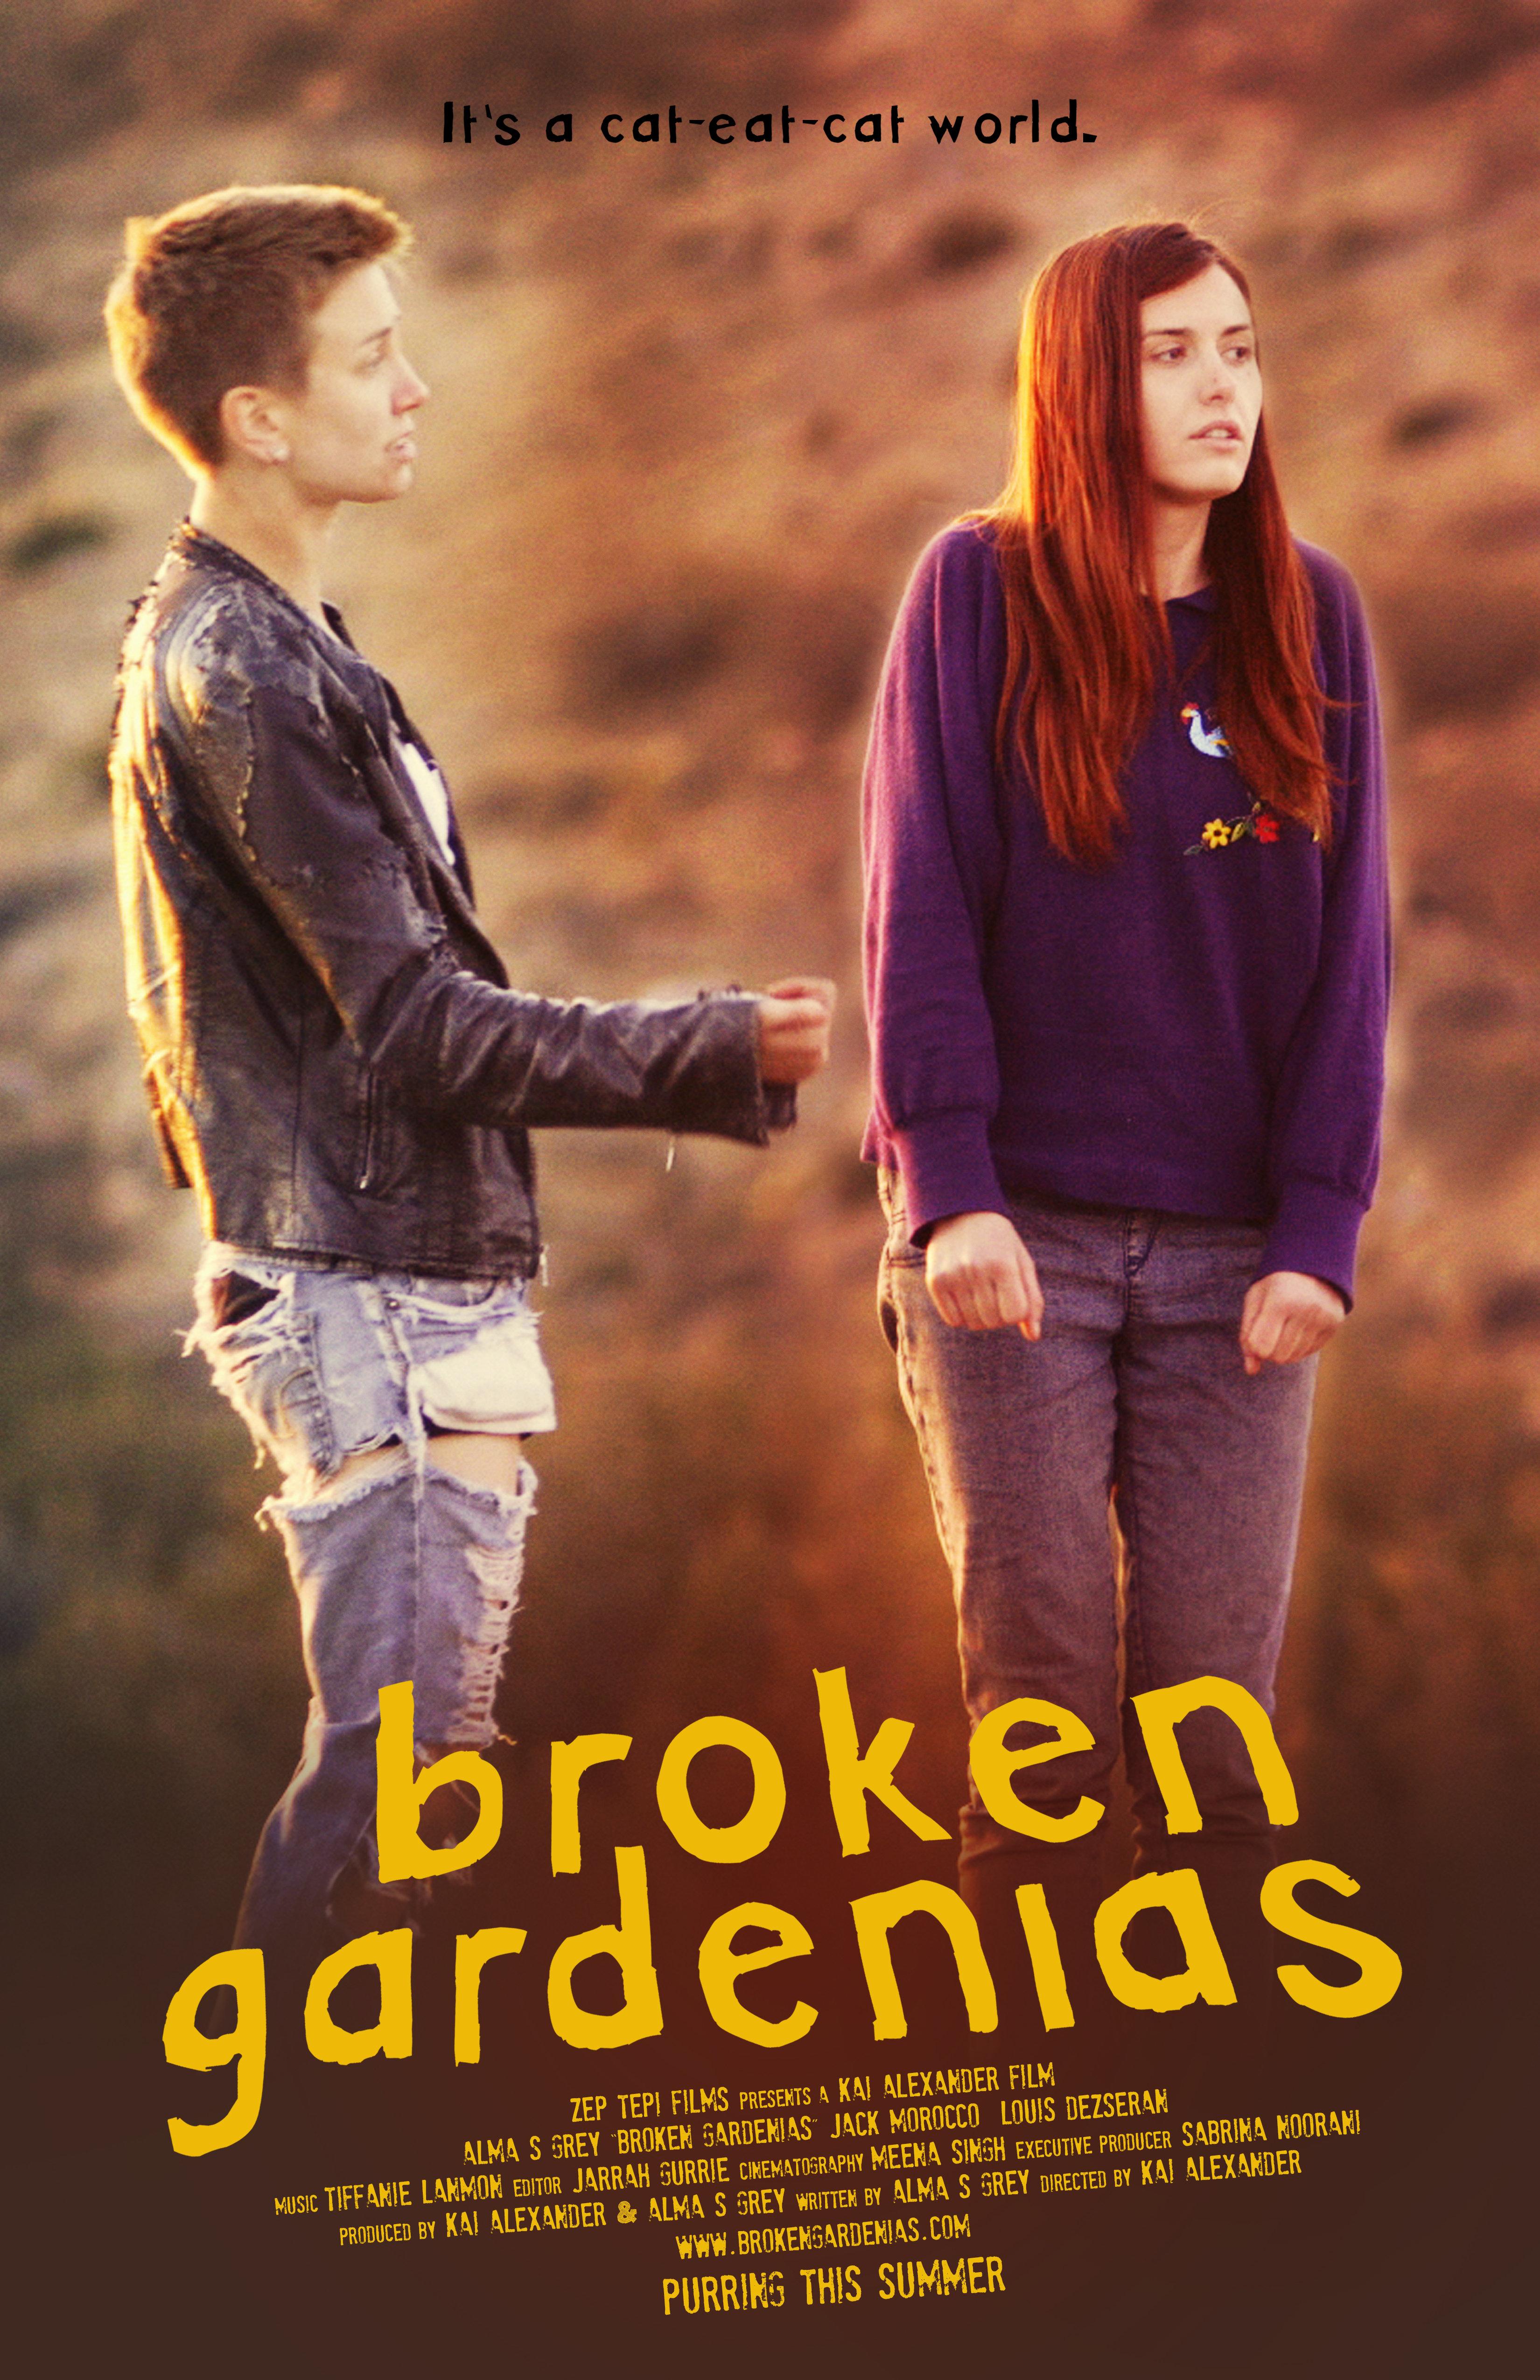 Broken Gardenias (2014)